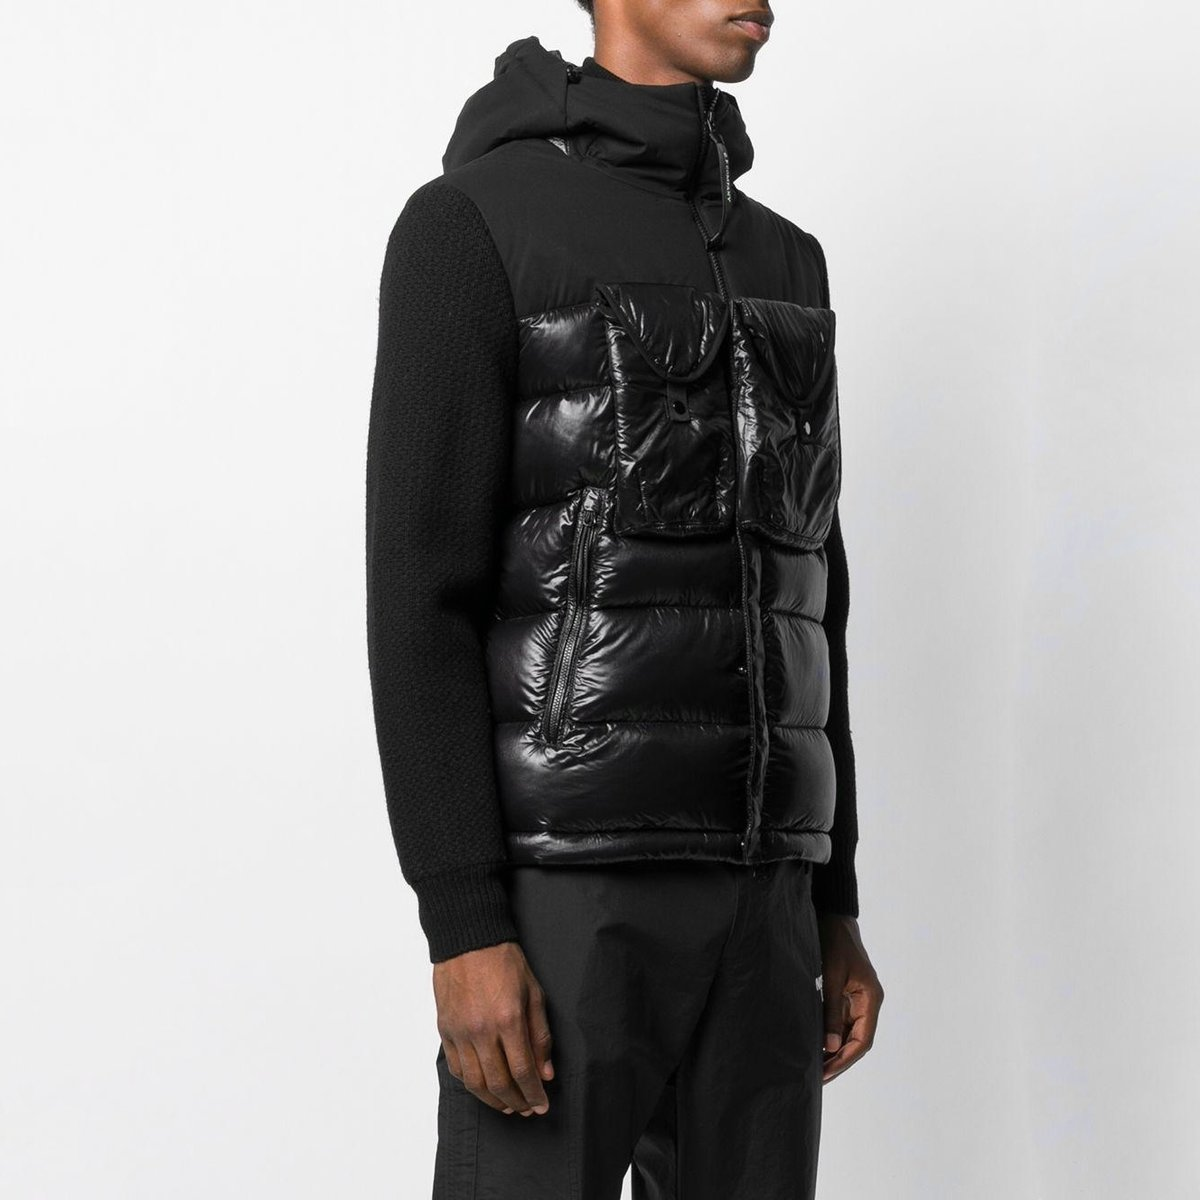 c-p-company-Black-Zipped-Padded-Jacket.jpg